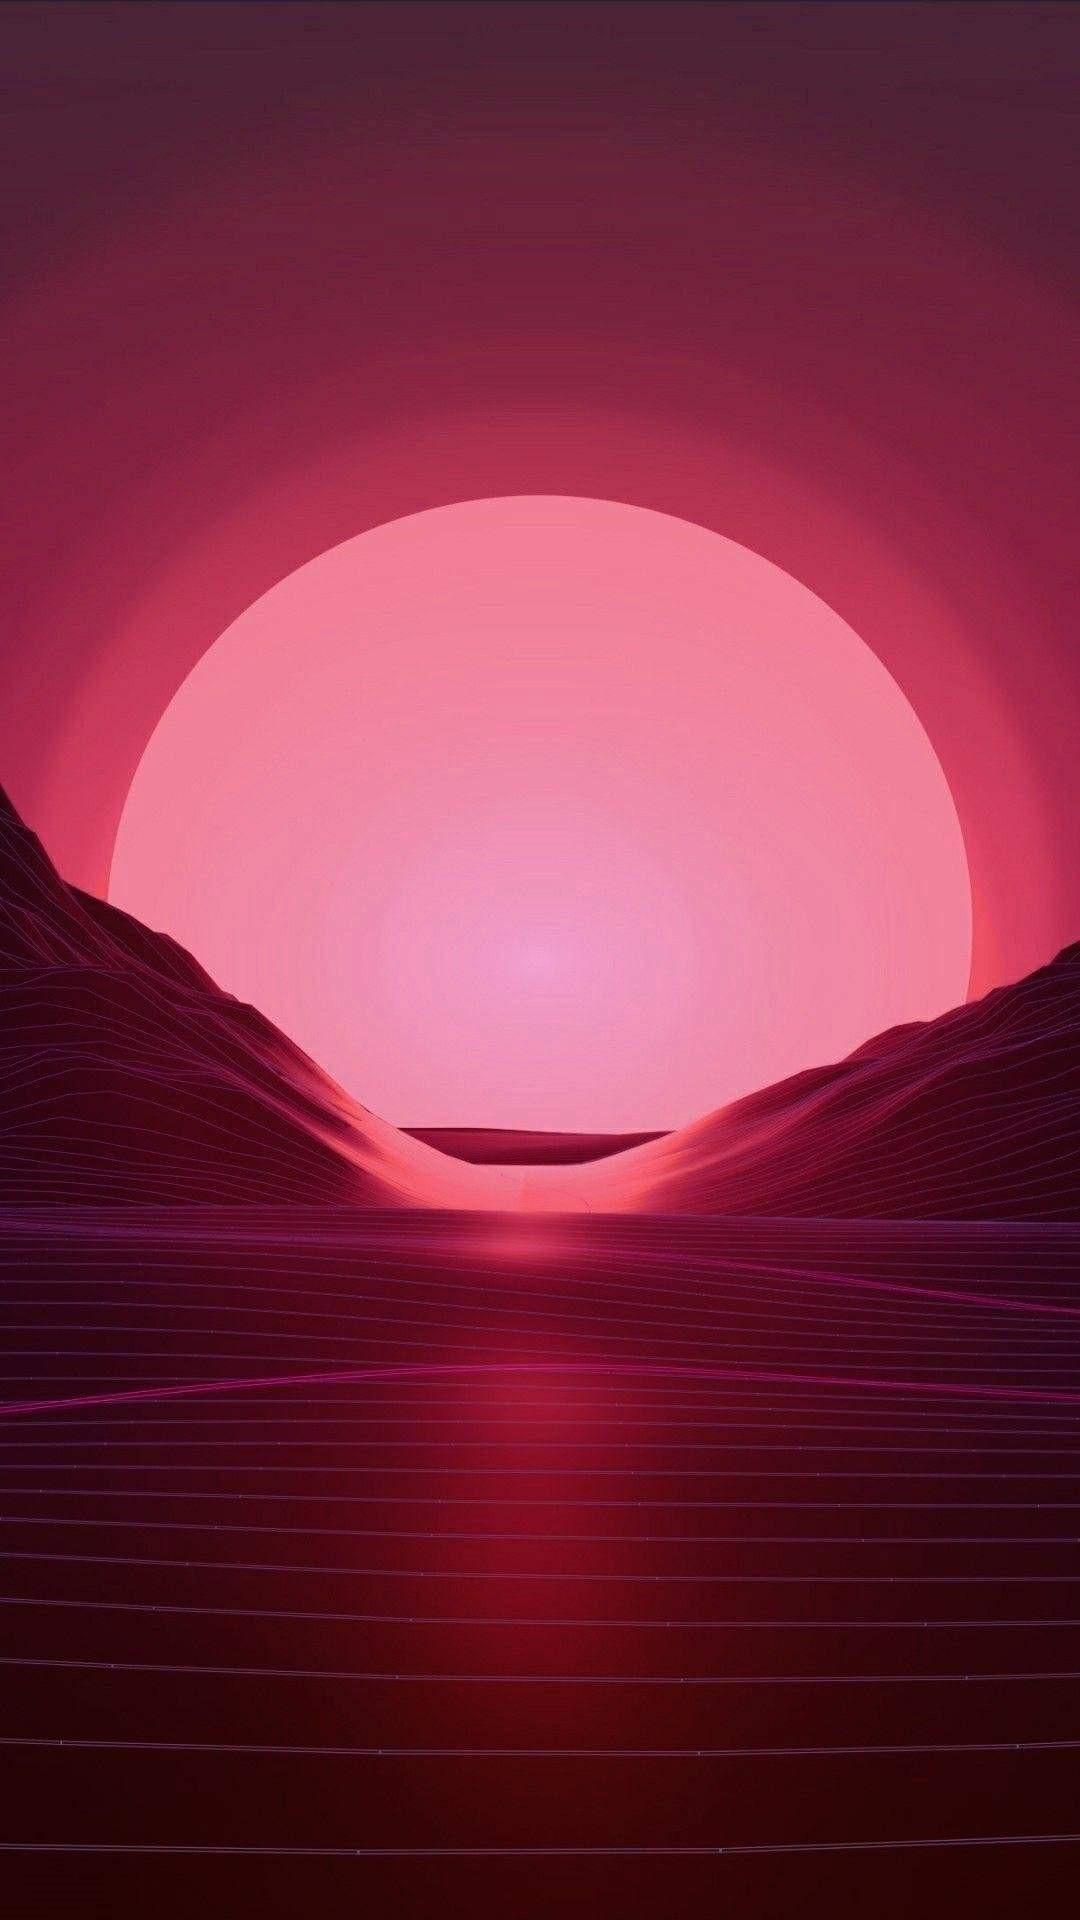 Vaporwave phone background